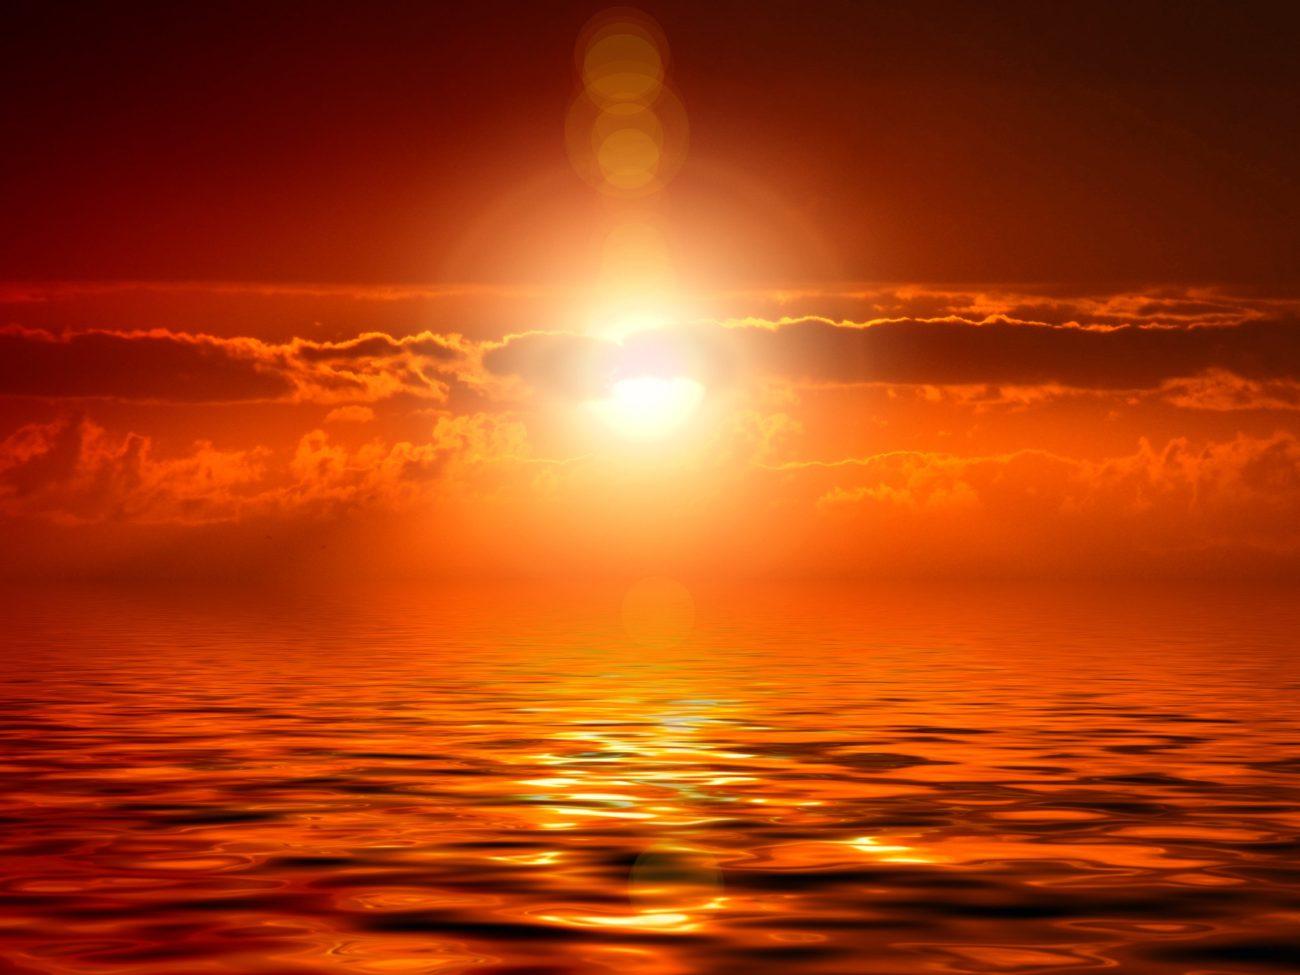 sunset, cloud, meditation